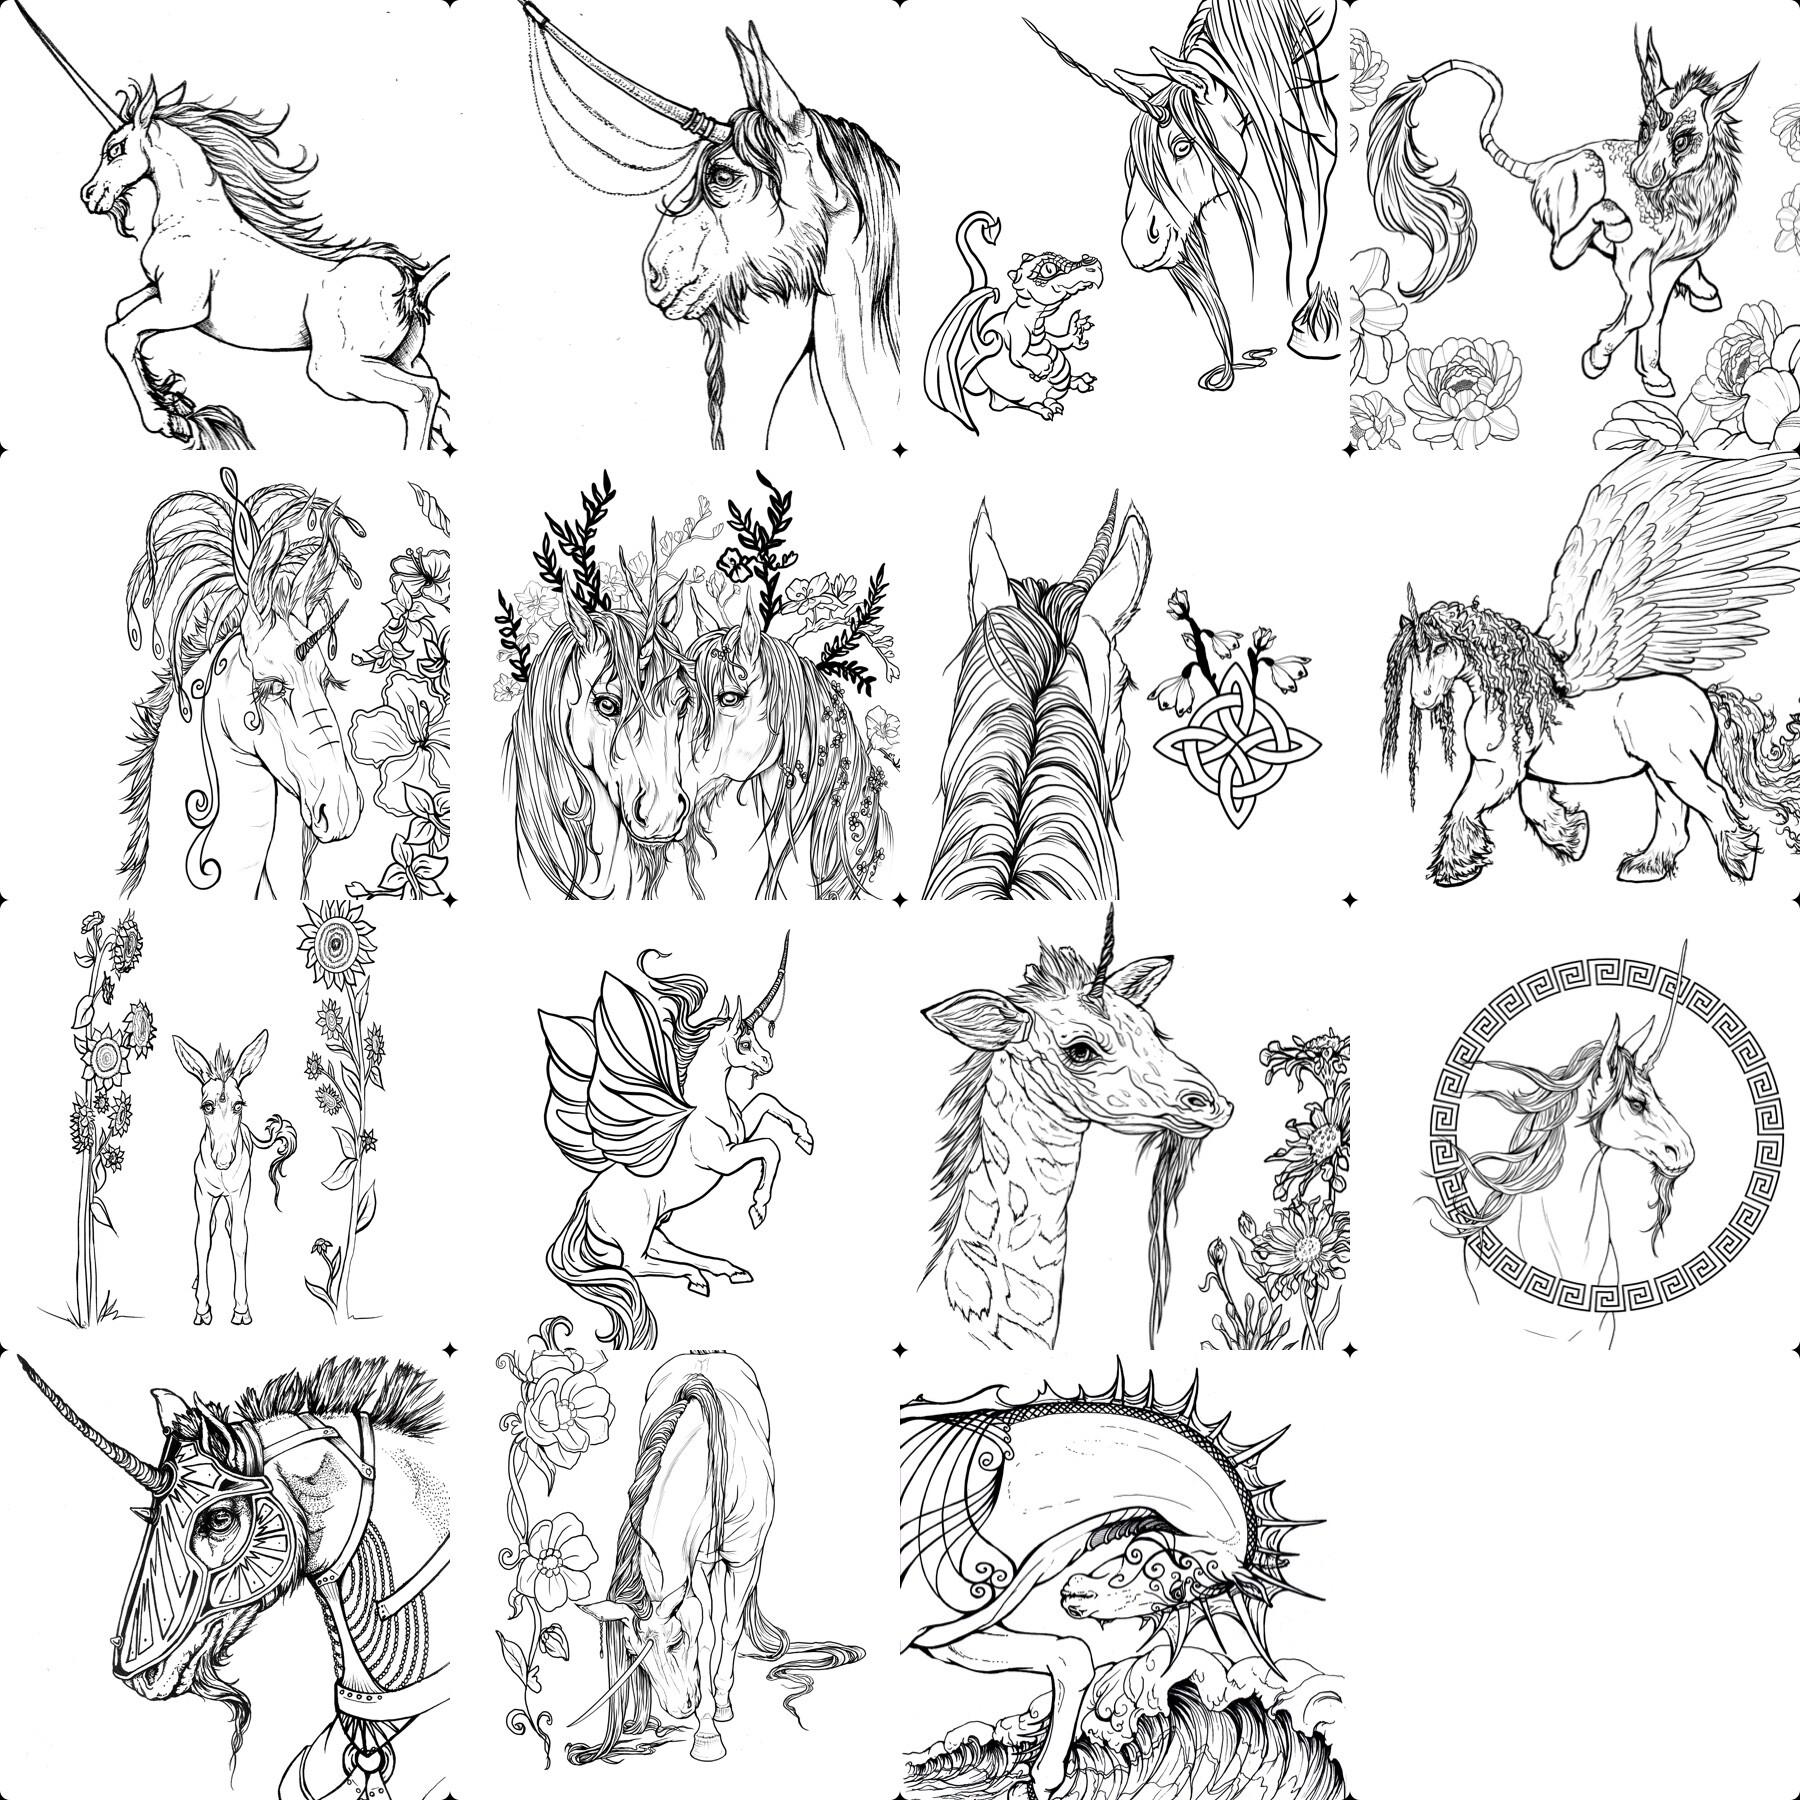 Artstation Unicorns And Dragons Printable Coloring Book Books Comics